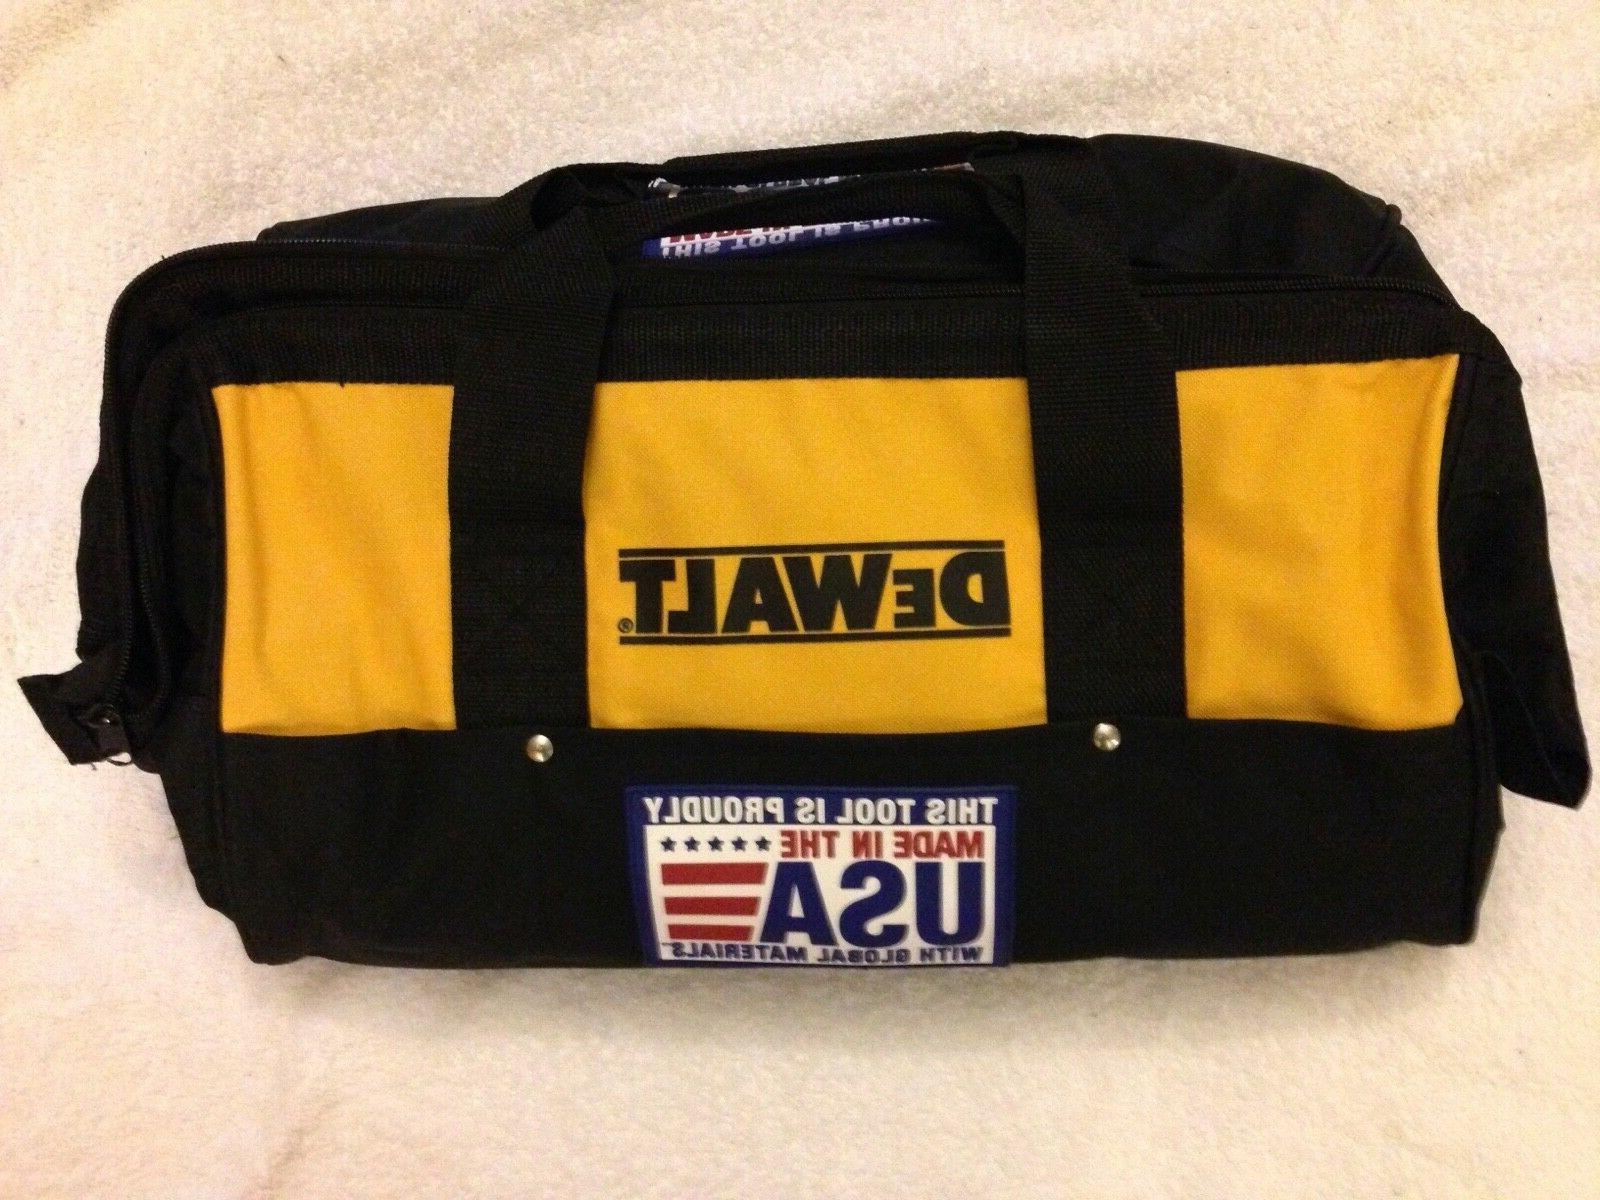 new dck019 19 tool bag heavy duty